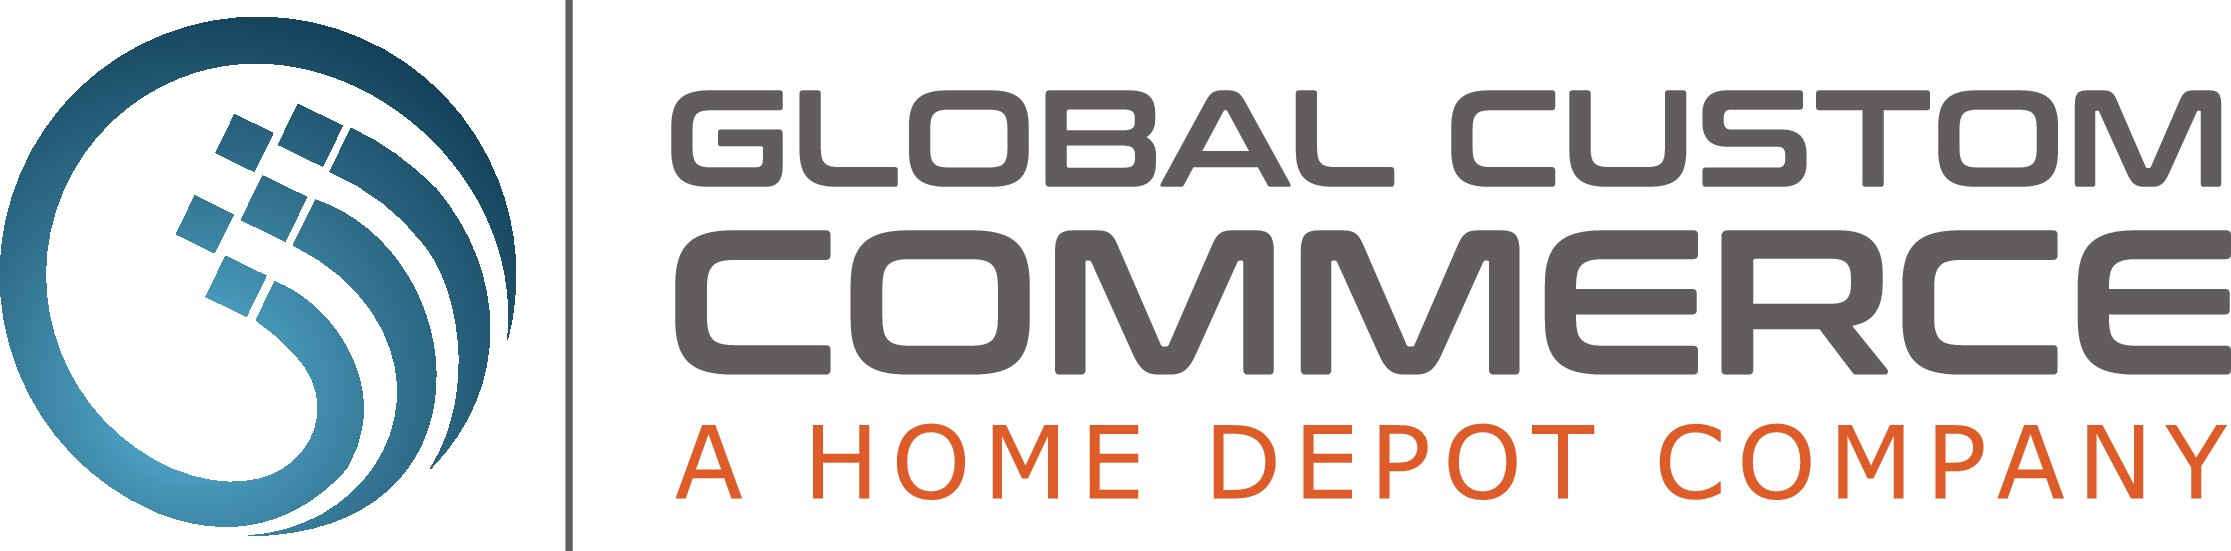 Create a captivating, futuristic modern logo for Global Custom Commerce - a Home Depot Company